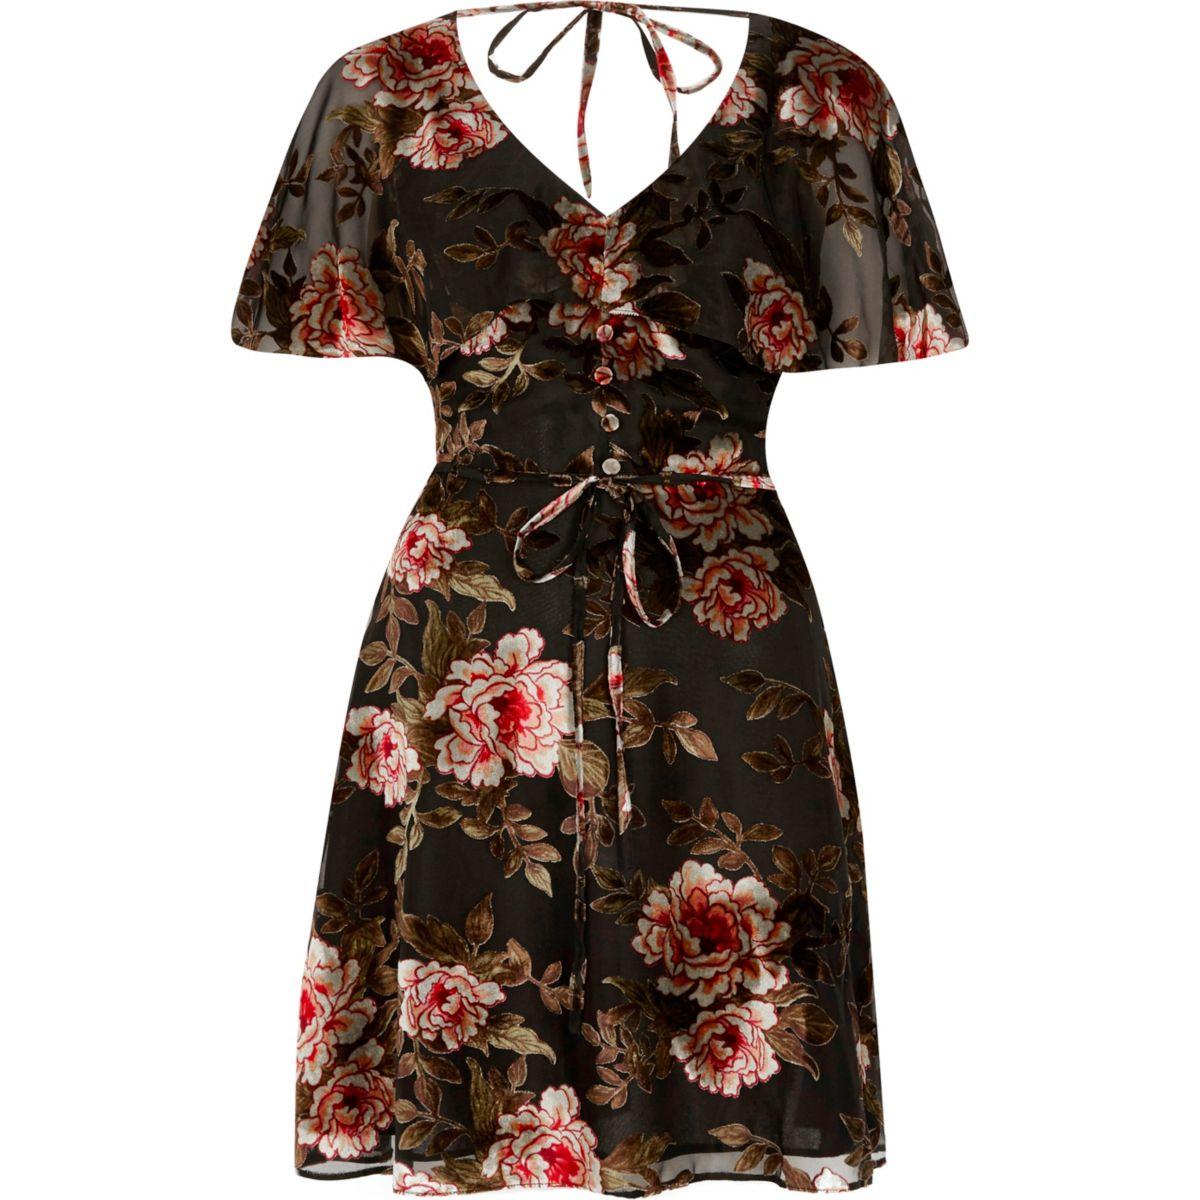 Black floral devore tea dress